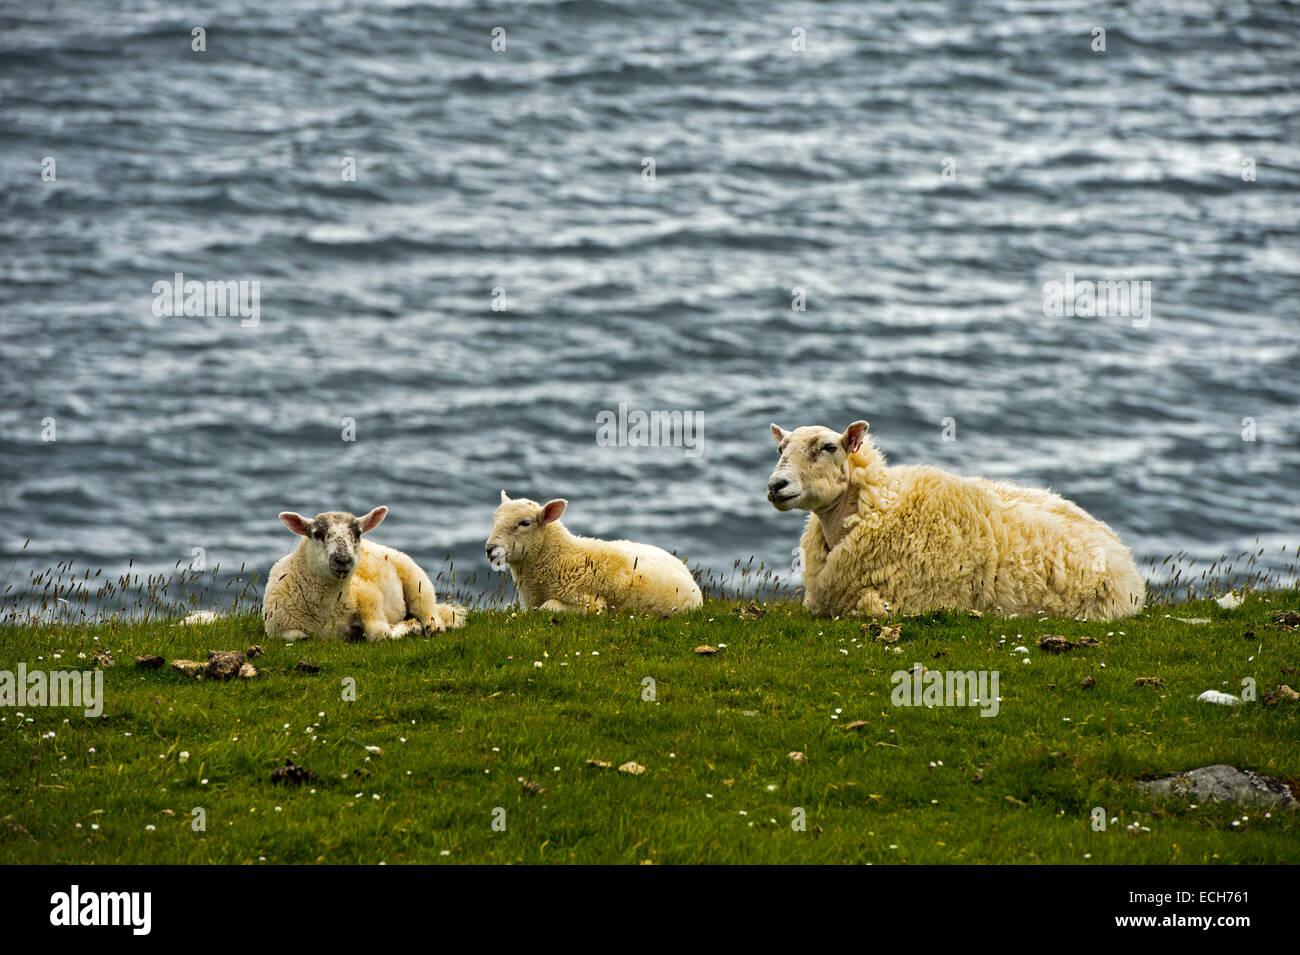 Wool sheep, ewe with two lambs lying on the shore, Isle of Skye, Inner Hebrides, Scotland, United Kingdom - Stock Image